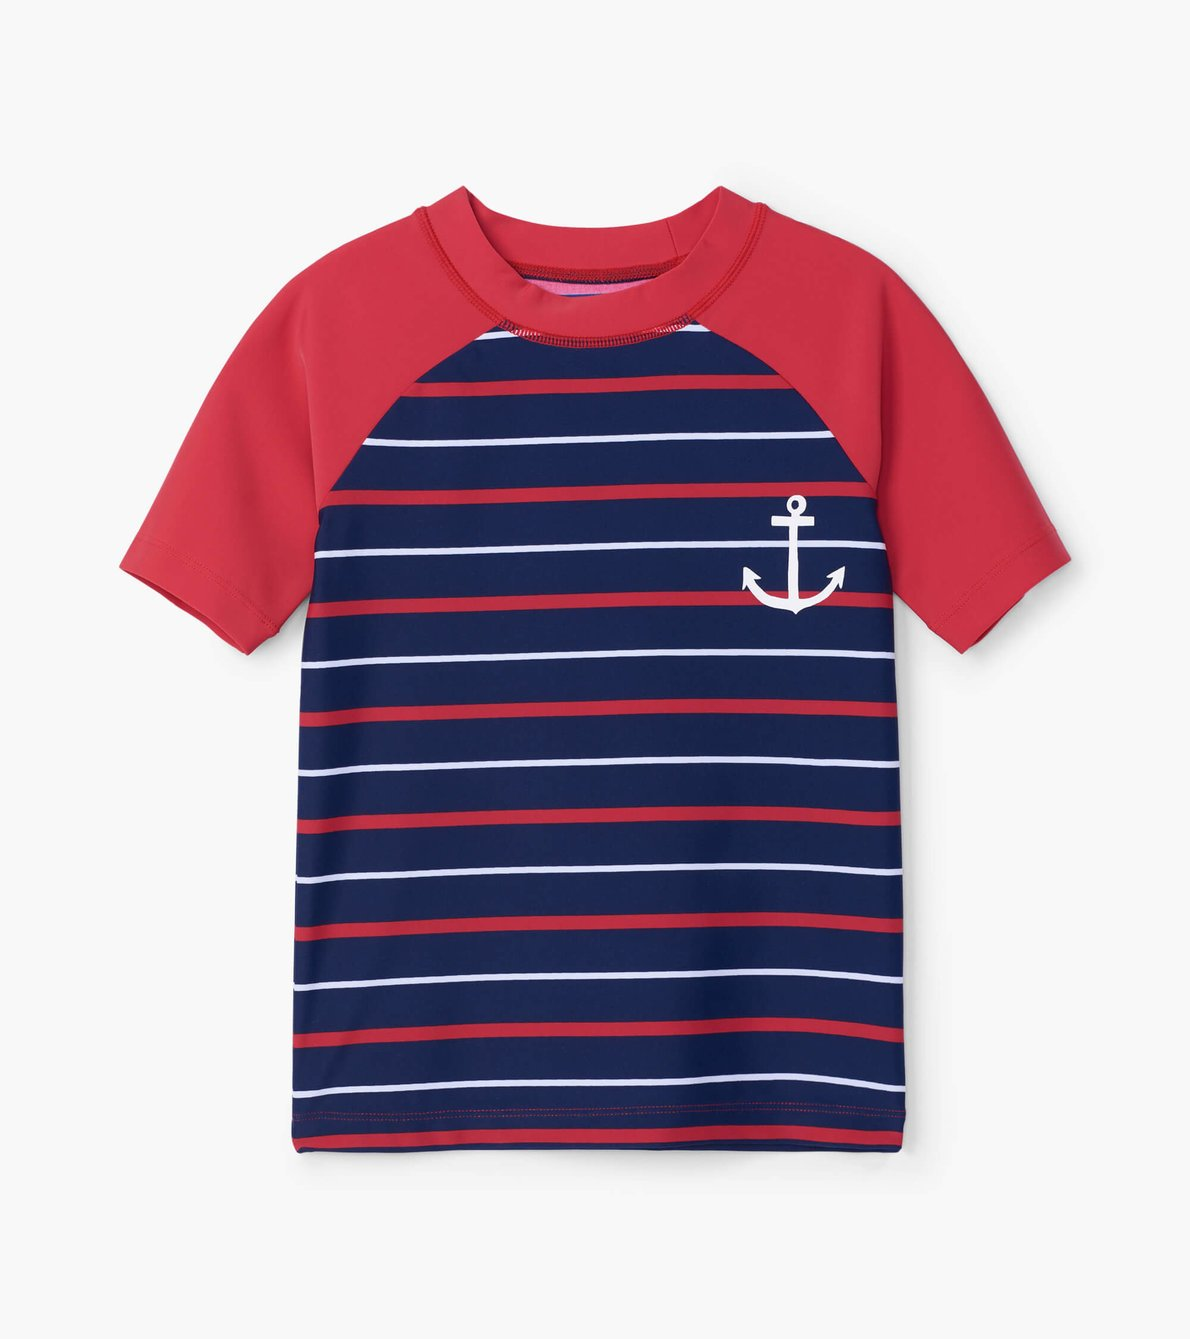 Hatley Nautical Stripe Short Sleeve Rashguard